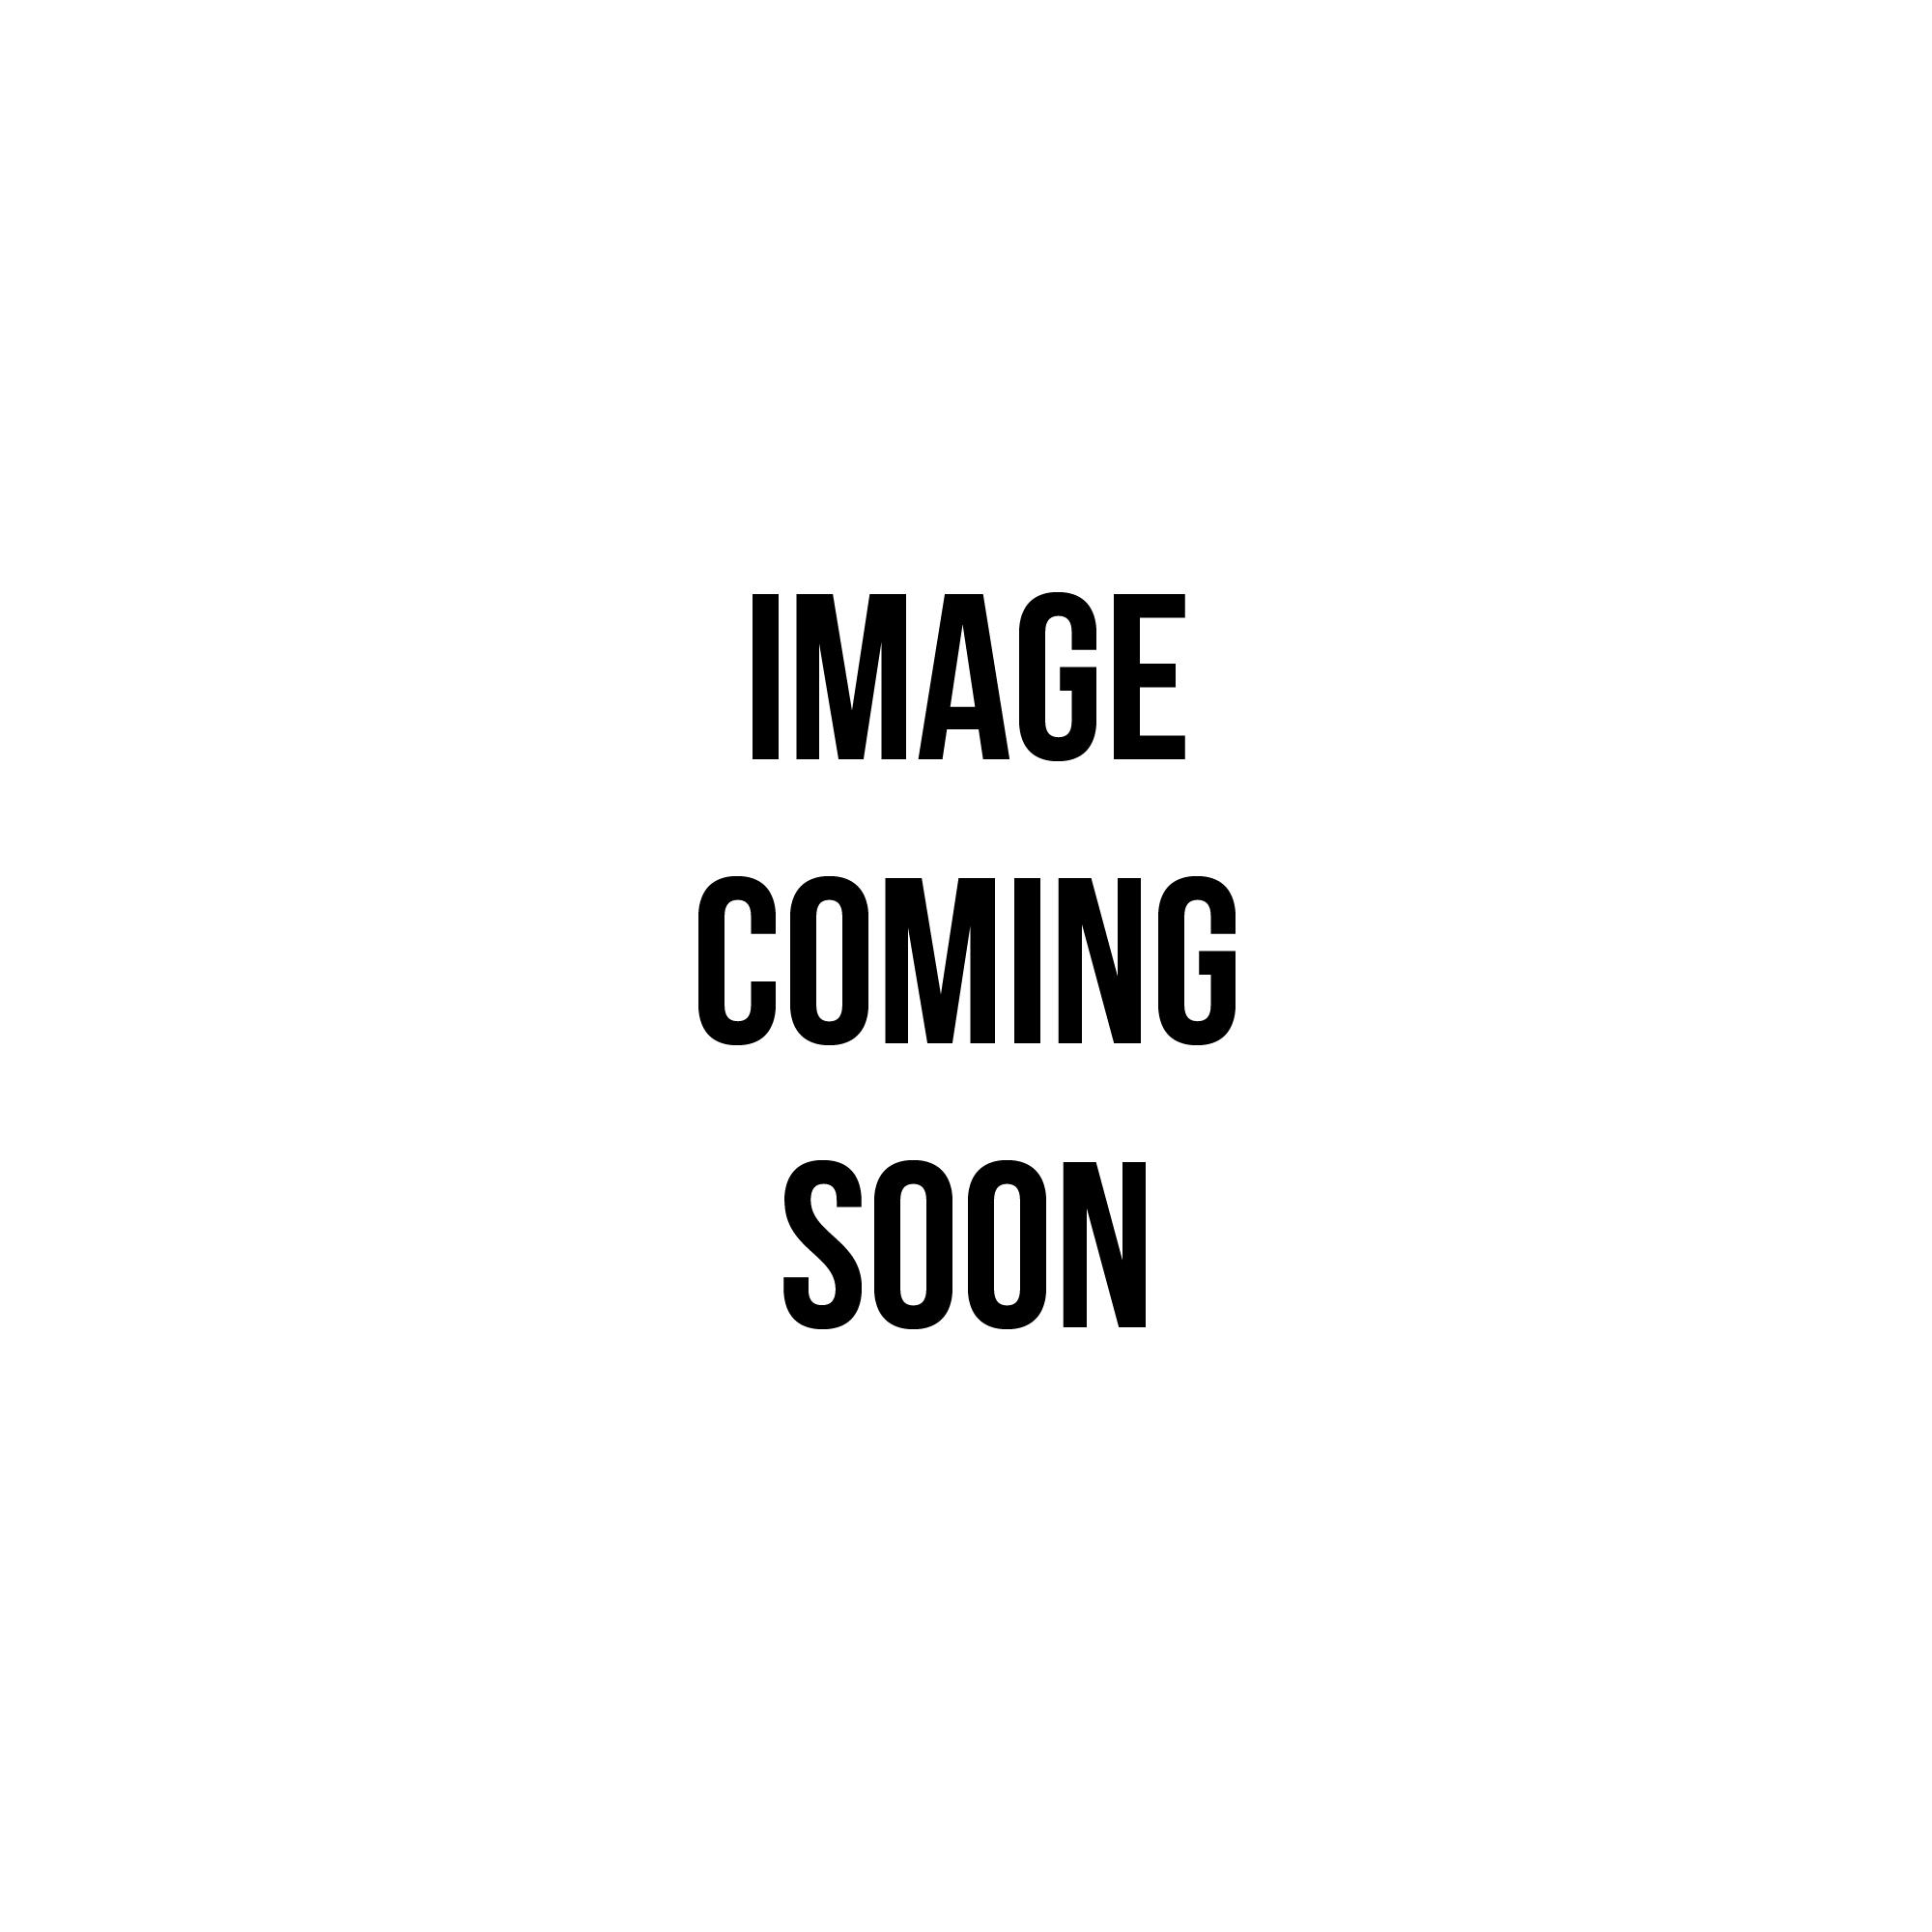 Nike Air Max 97 Ultra 17 LX GunsmokeWhite Atmosphere Grey Suede For Sale